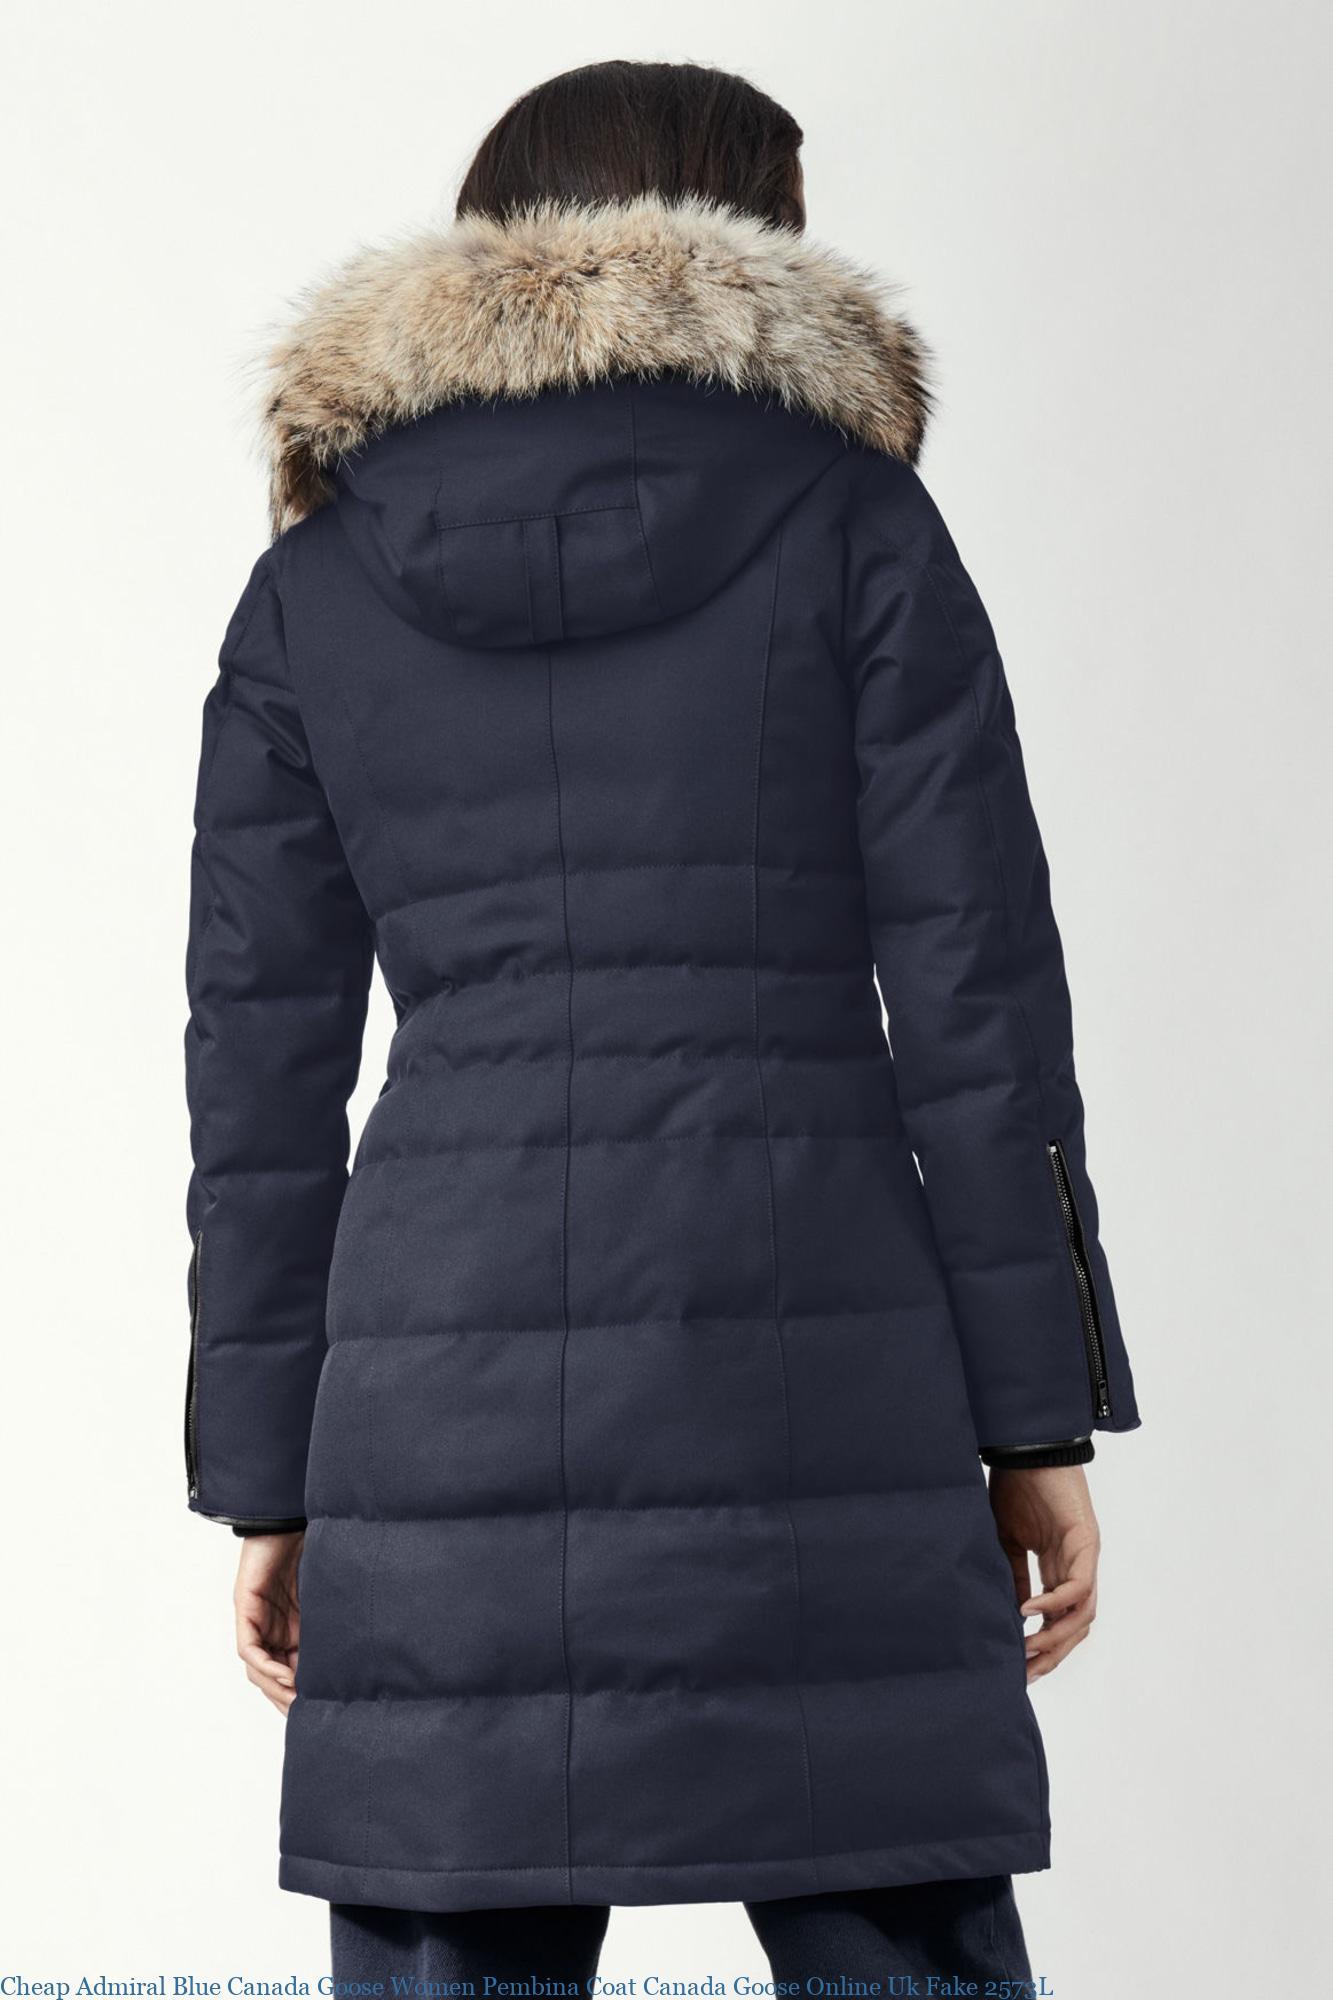 cheap admiral blue canada goose women pembina coat canada. Black Bedroom Furniture Sets. Home Design Ideas